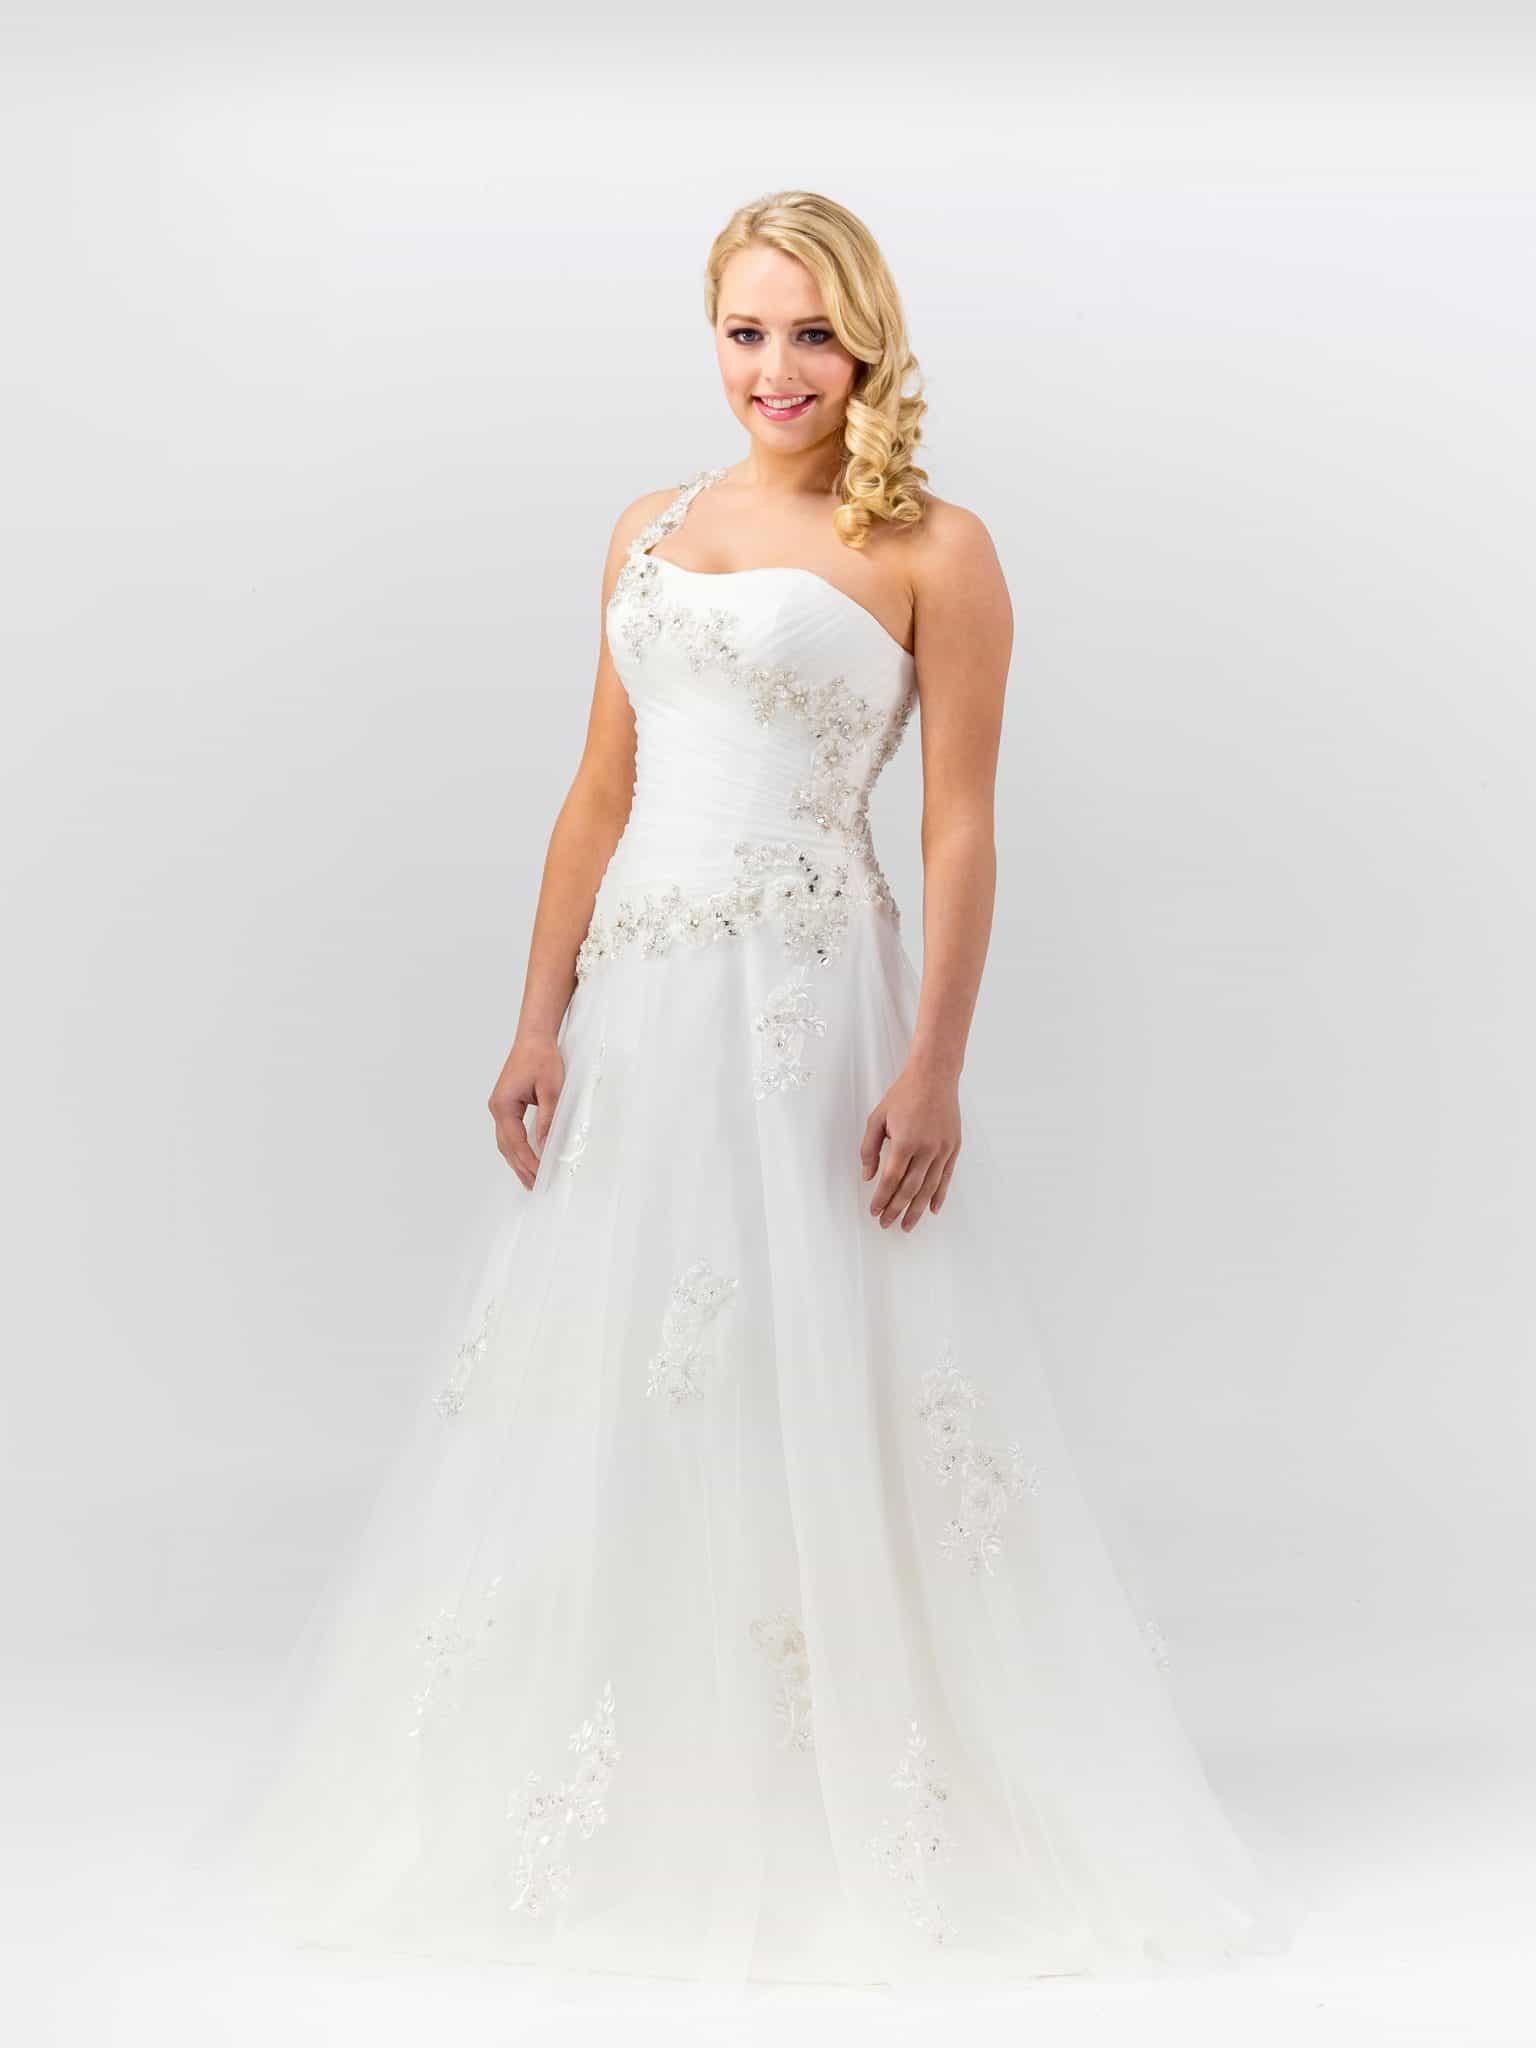 Magnloia Wedding Dress by Magnolia Bridal Designs